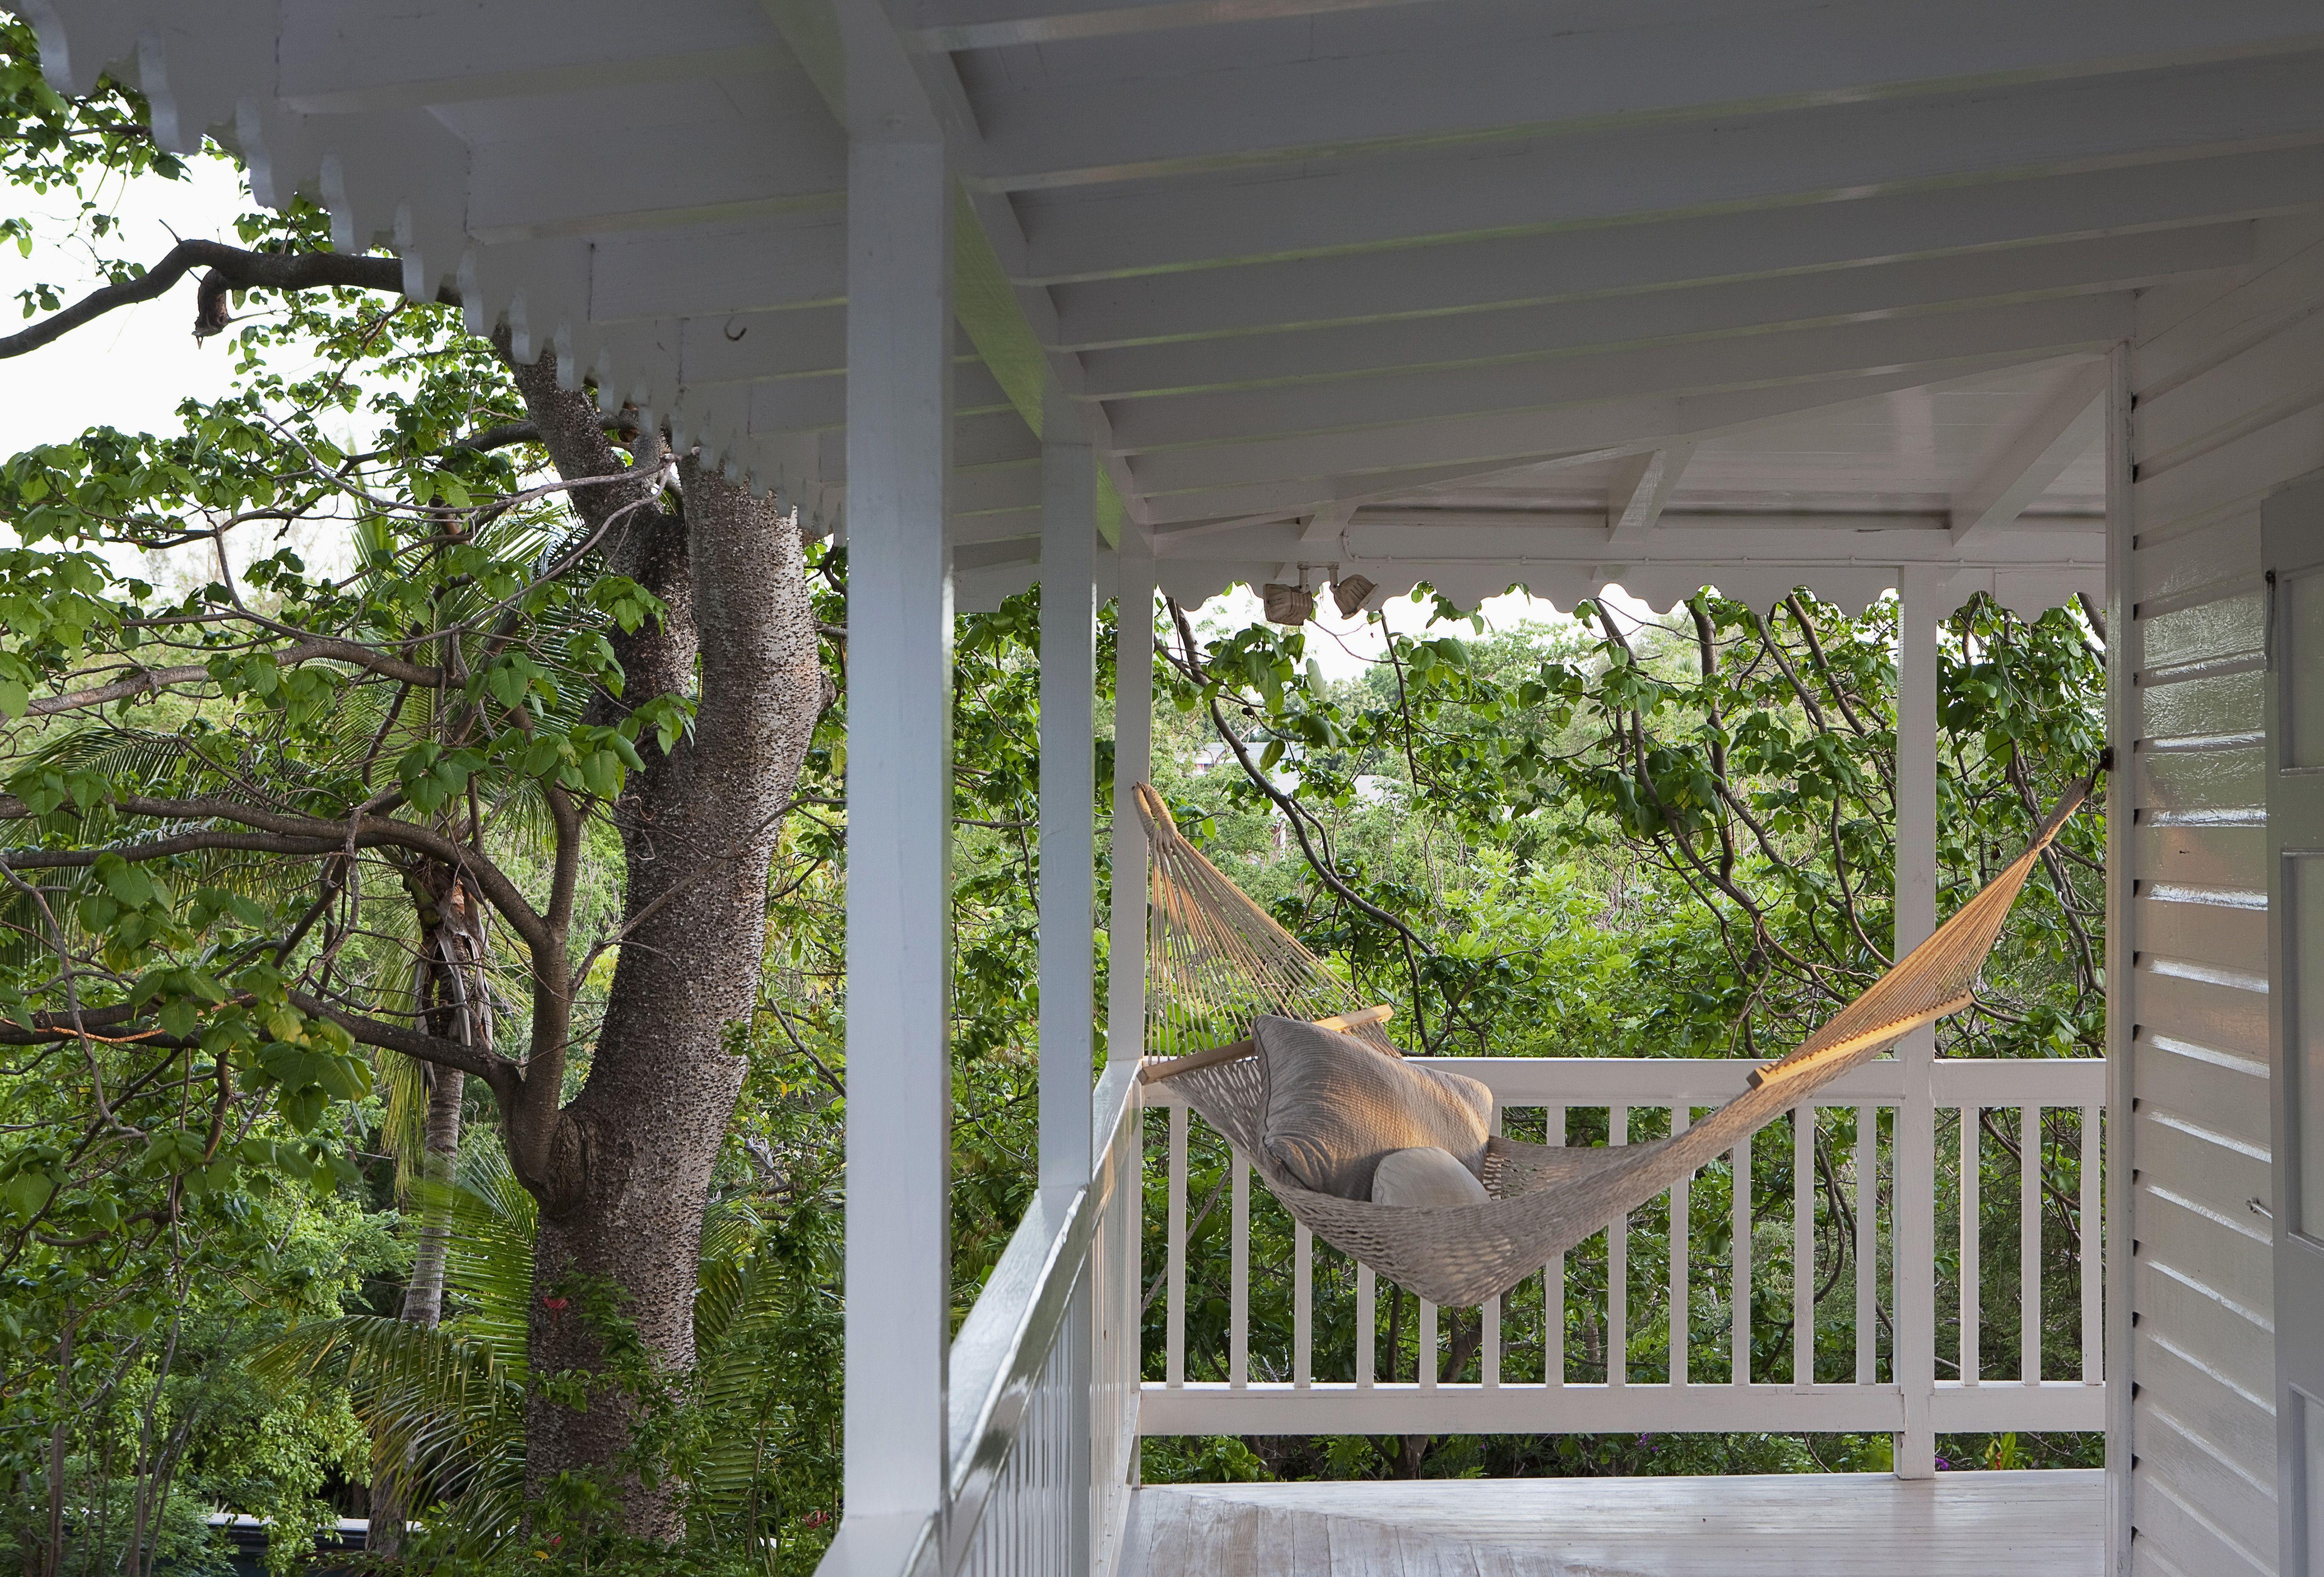 Pinney Beach House, Nevis, Nevis, Saint Kitts and Nevis. Architect: Naomi Cleaver, 2010.